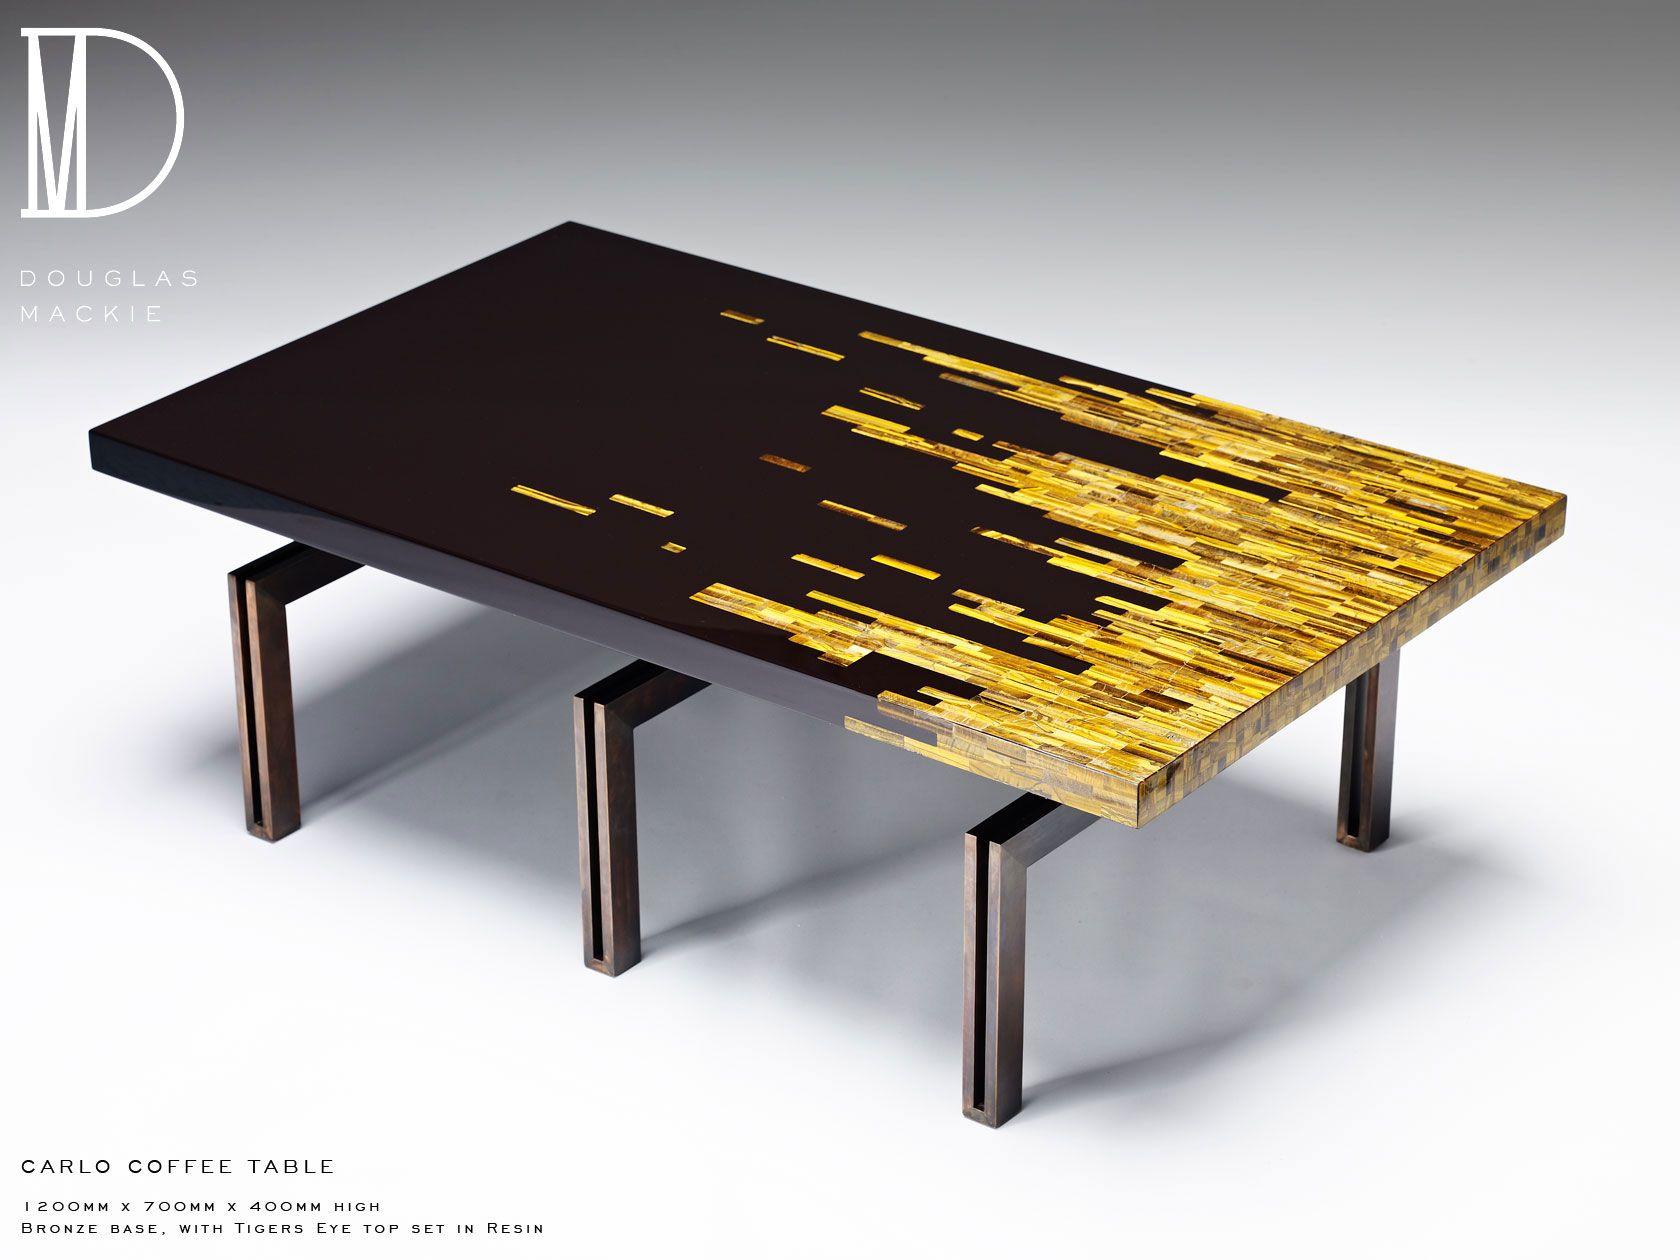 Dm Douglas Mackie Design Coffee Table Furniture Cool Coffee Tables